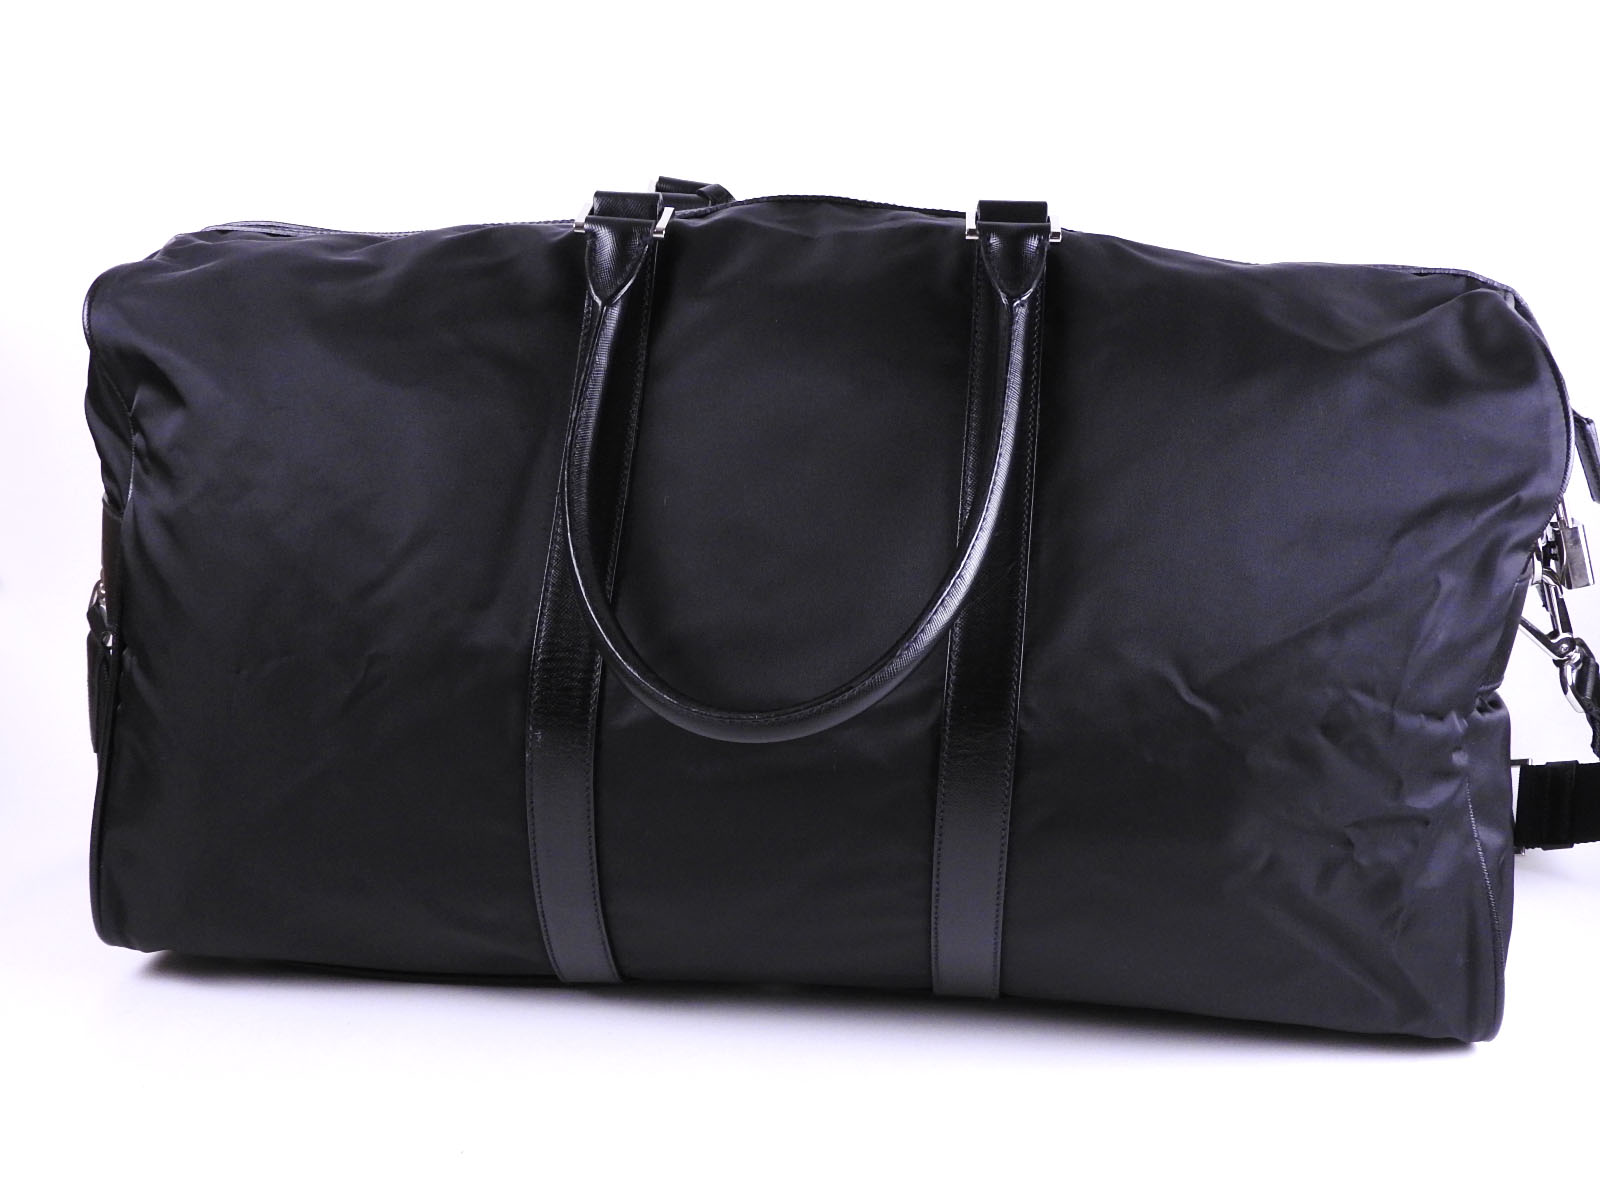 8e8ba0991fab PRADA Tessuto Nylon Saffiano Leather 2way Boston Travel Bag Black ...